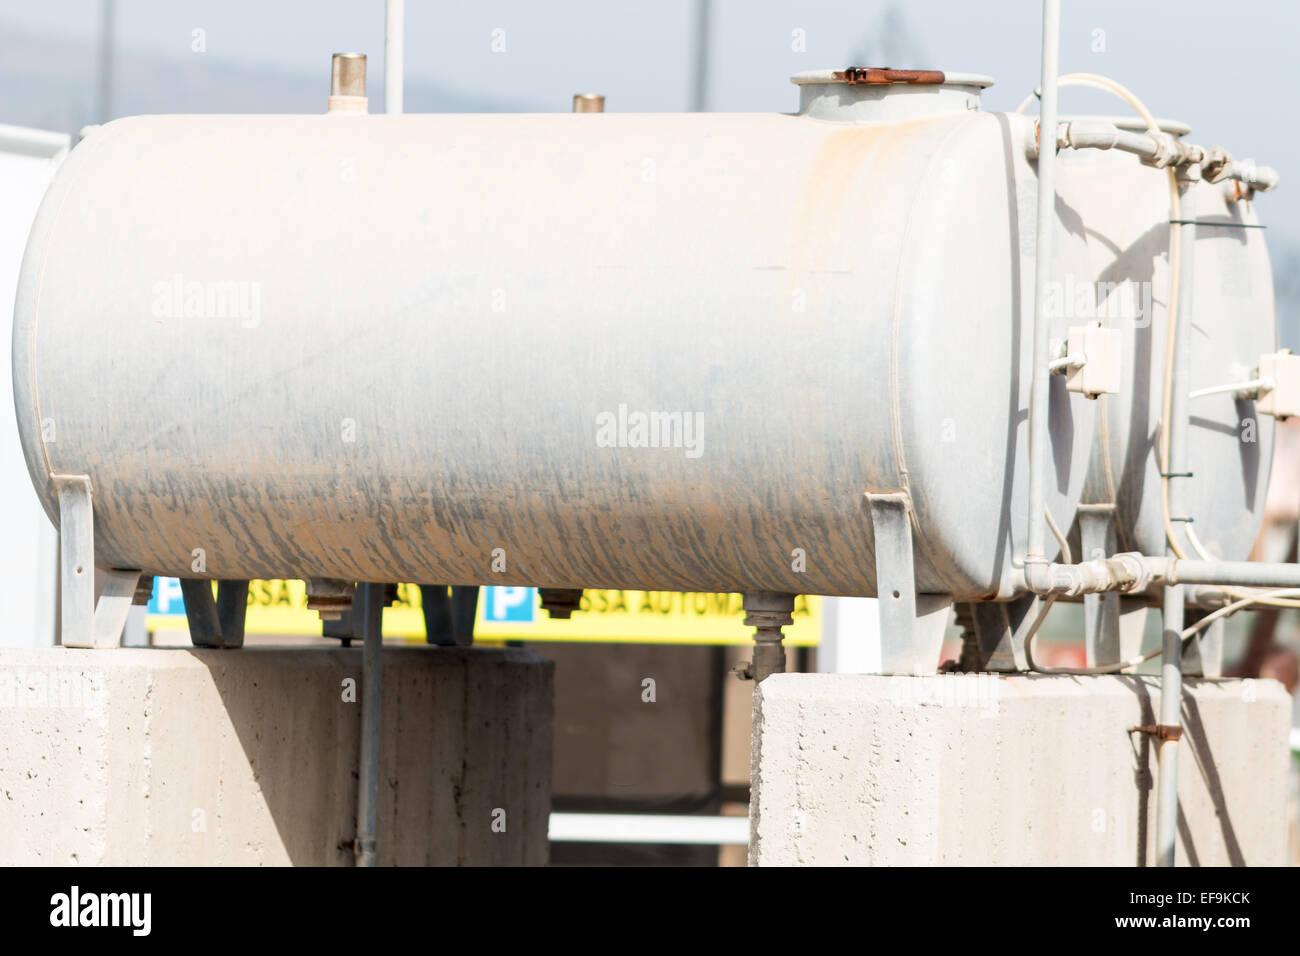 Hot Water Storage Tank Stockfotos & Hot Water Storage Tank Bilder ...